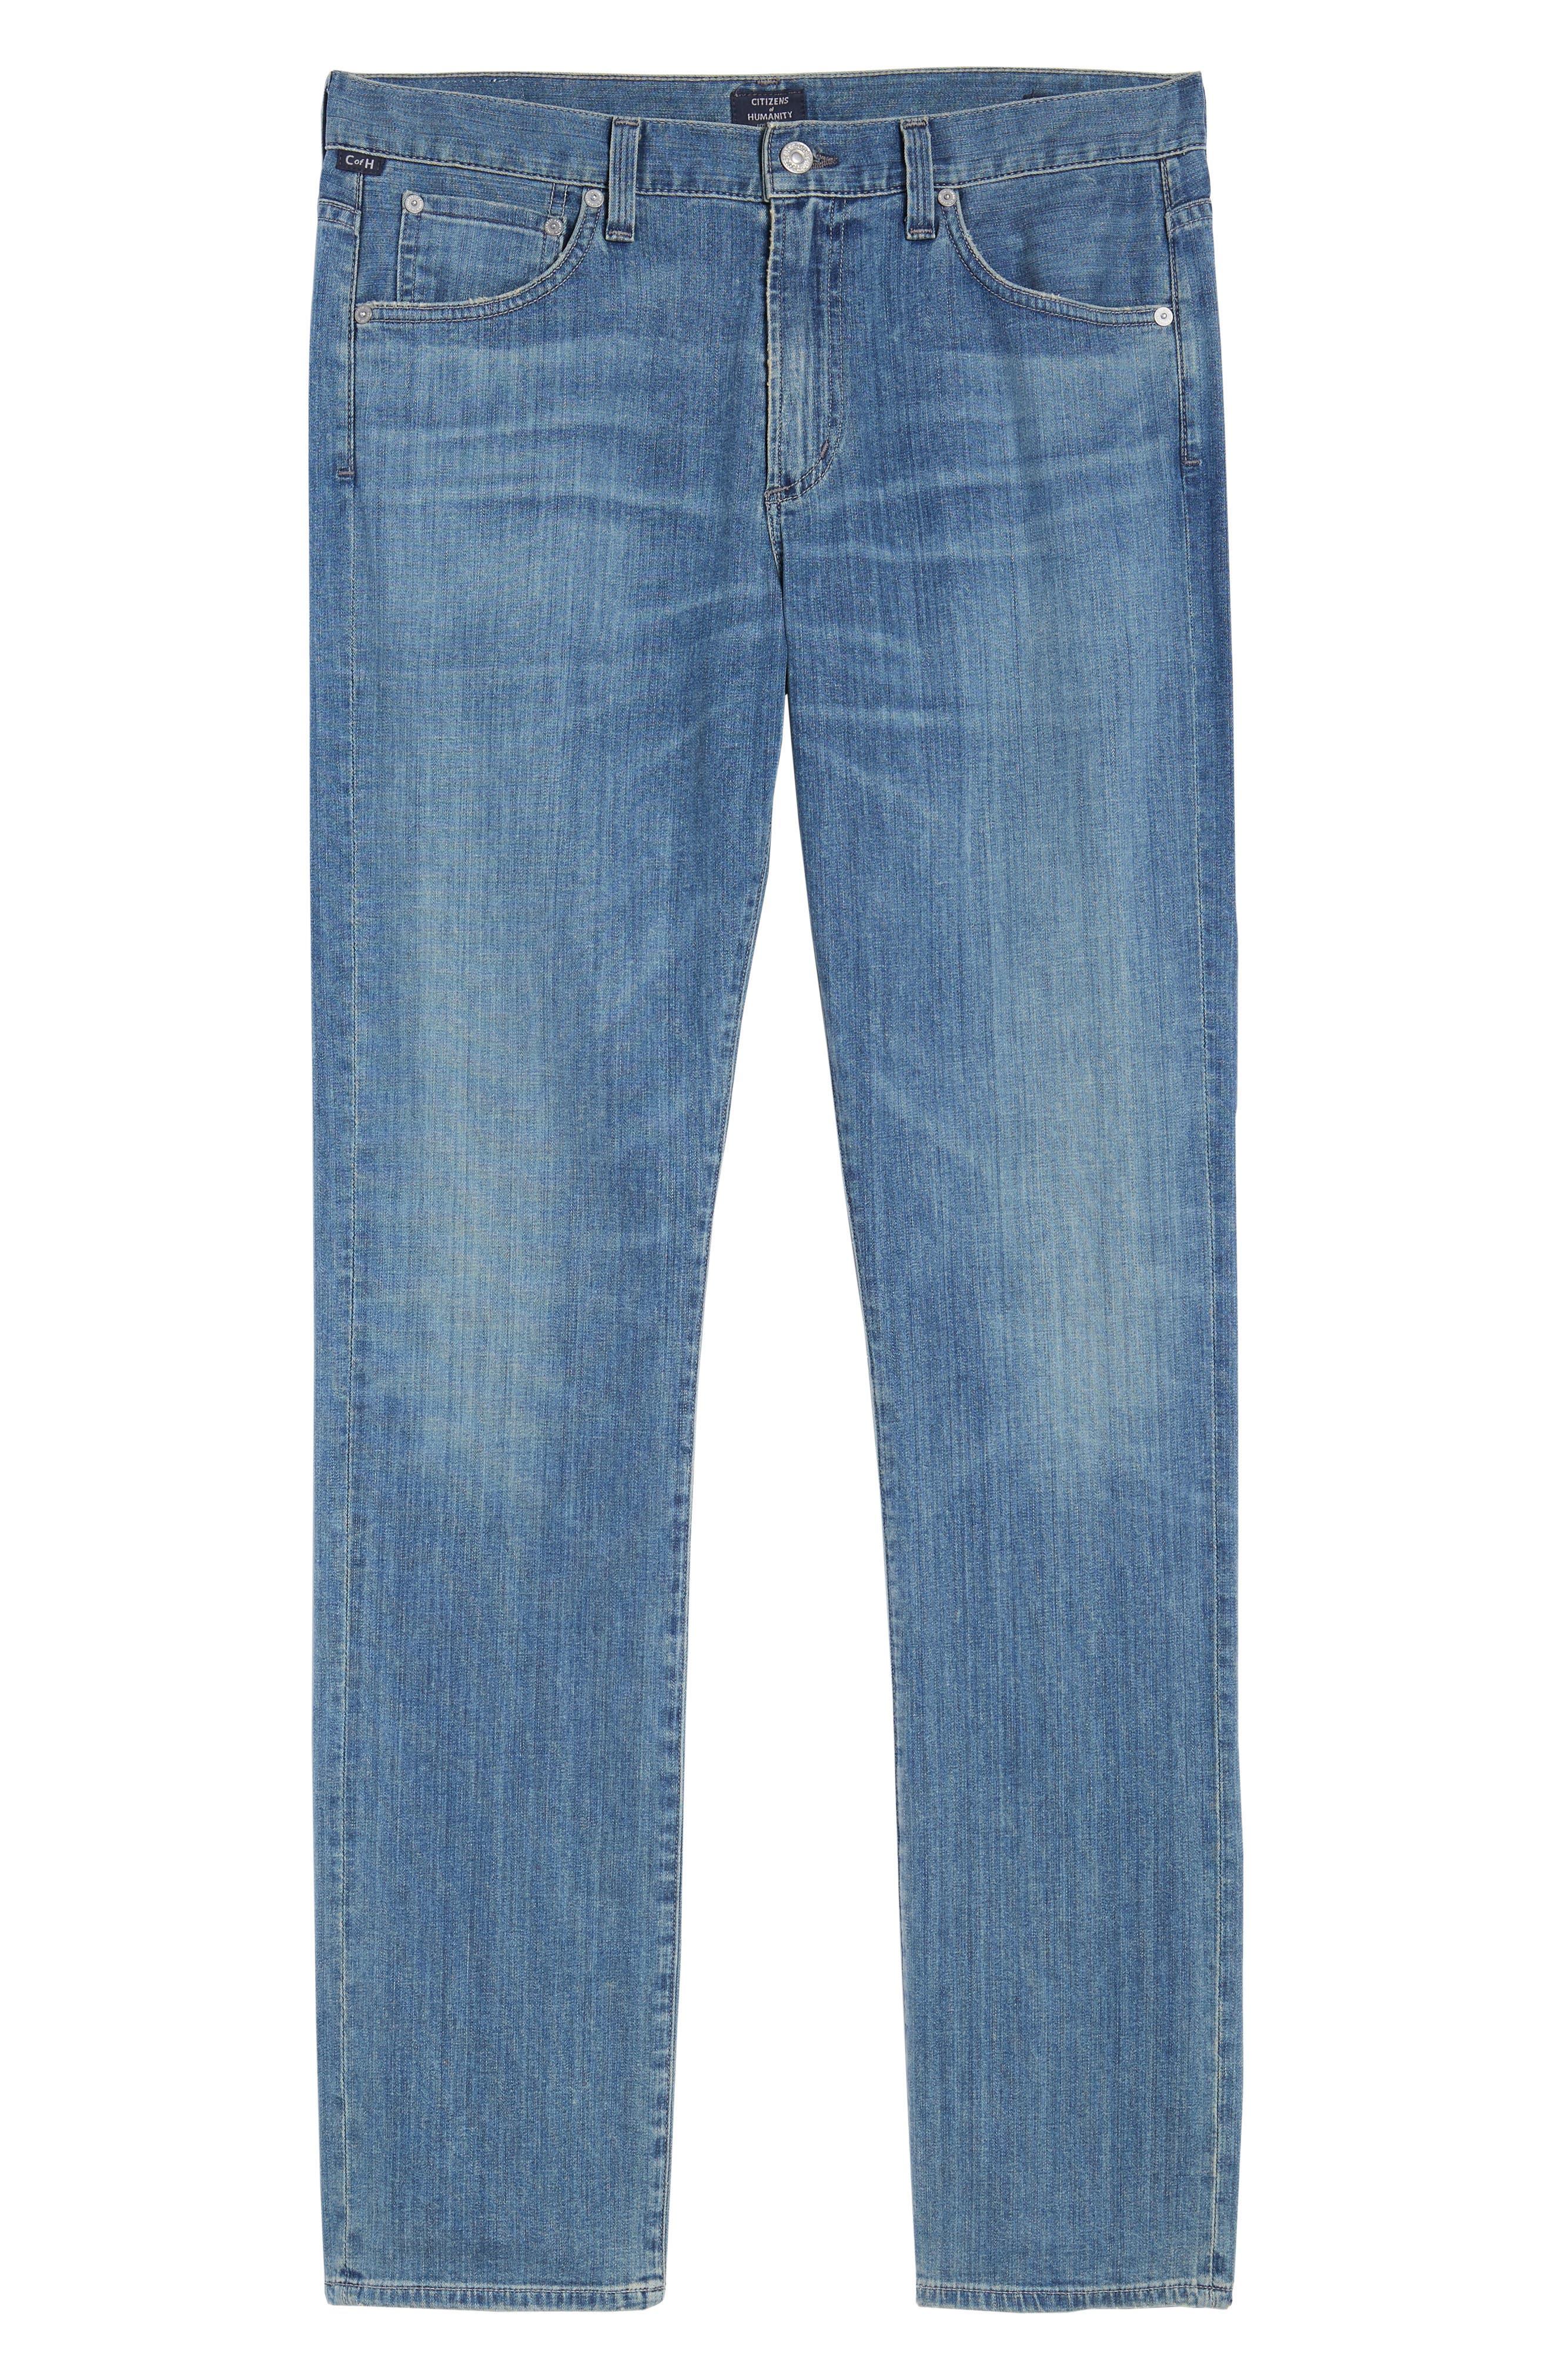 Gage Slim Straight Leg Jeans,                             Alternate thumbnail 6, color,                             Costa